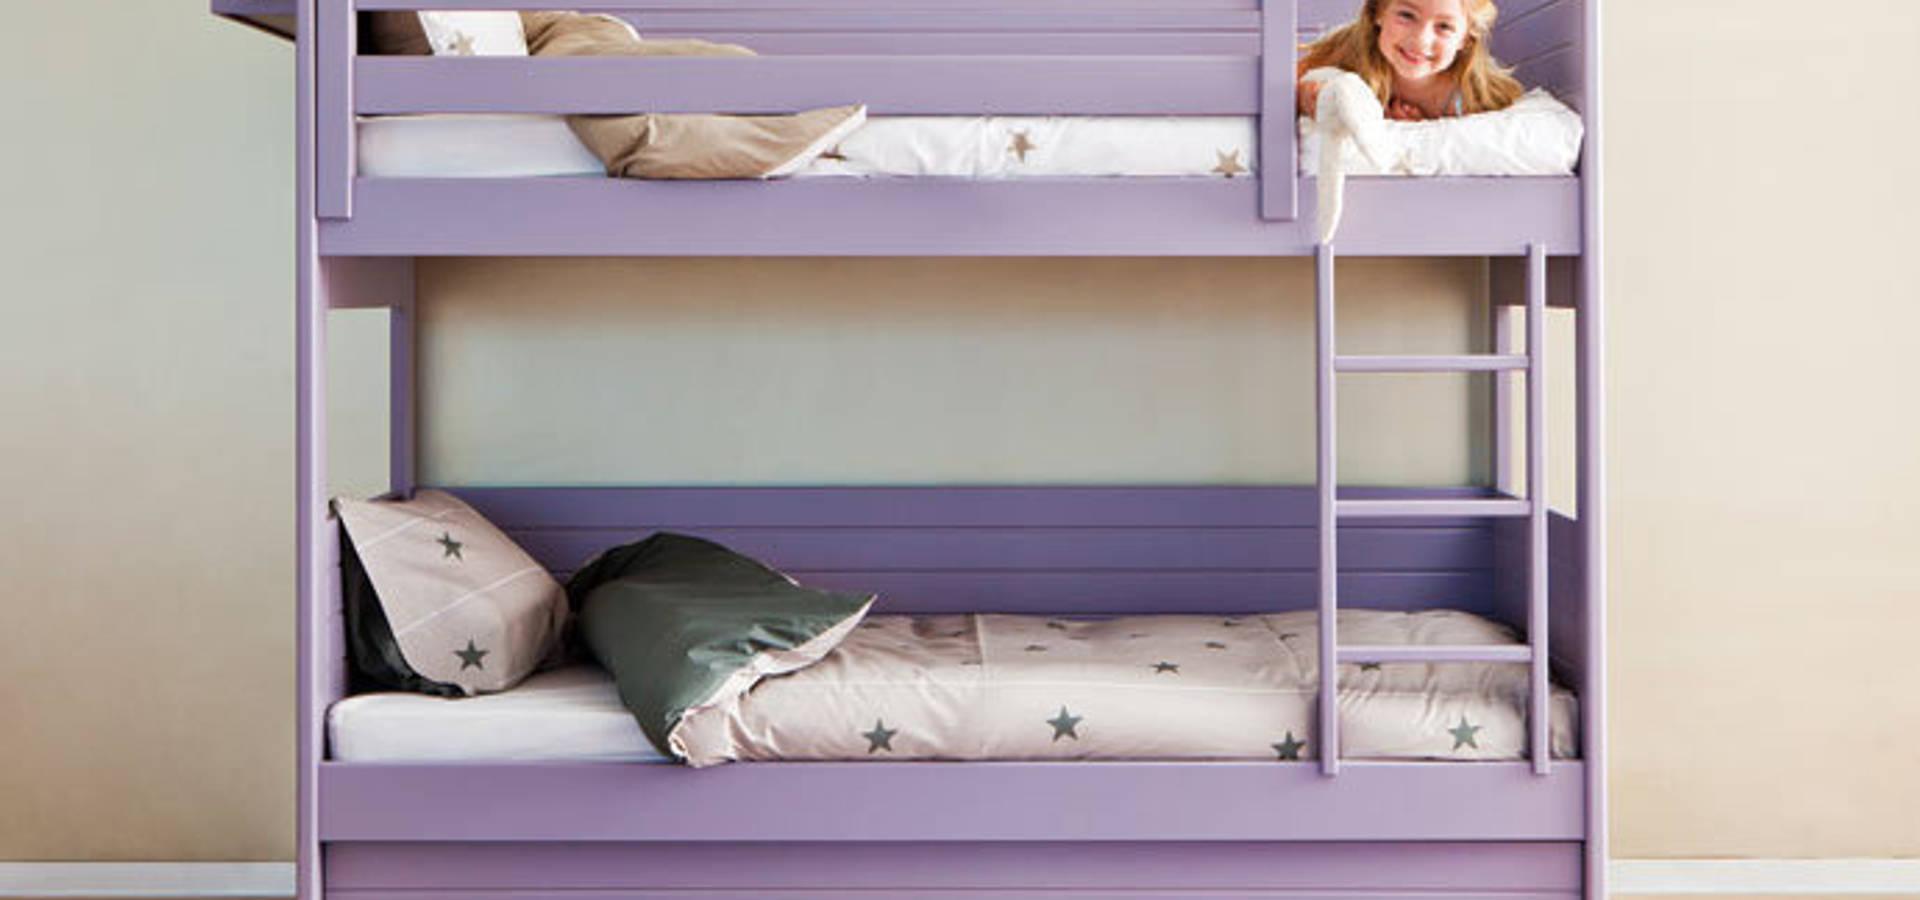 Mobiliario juvenil de sof s camas cruces homify - Sofa cama cruces ...